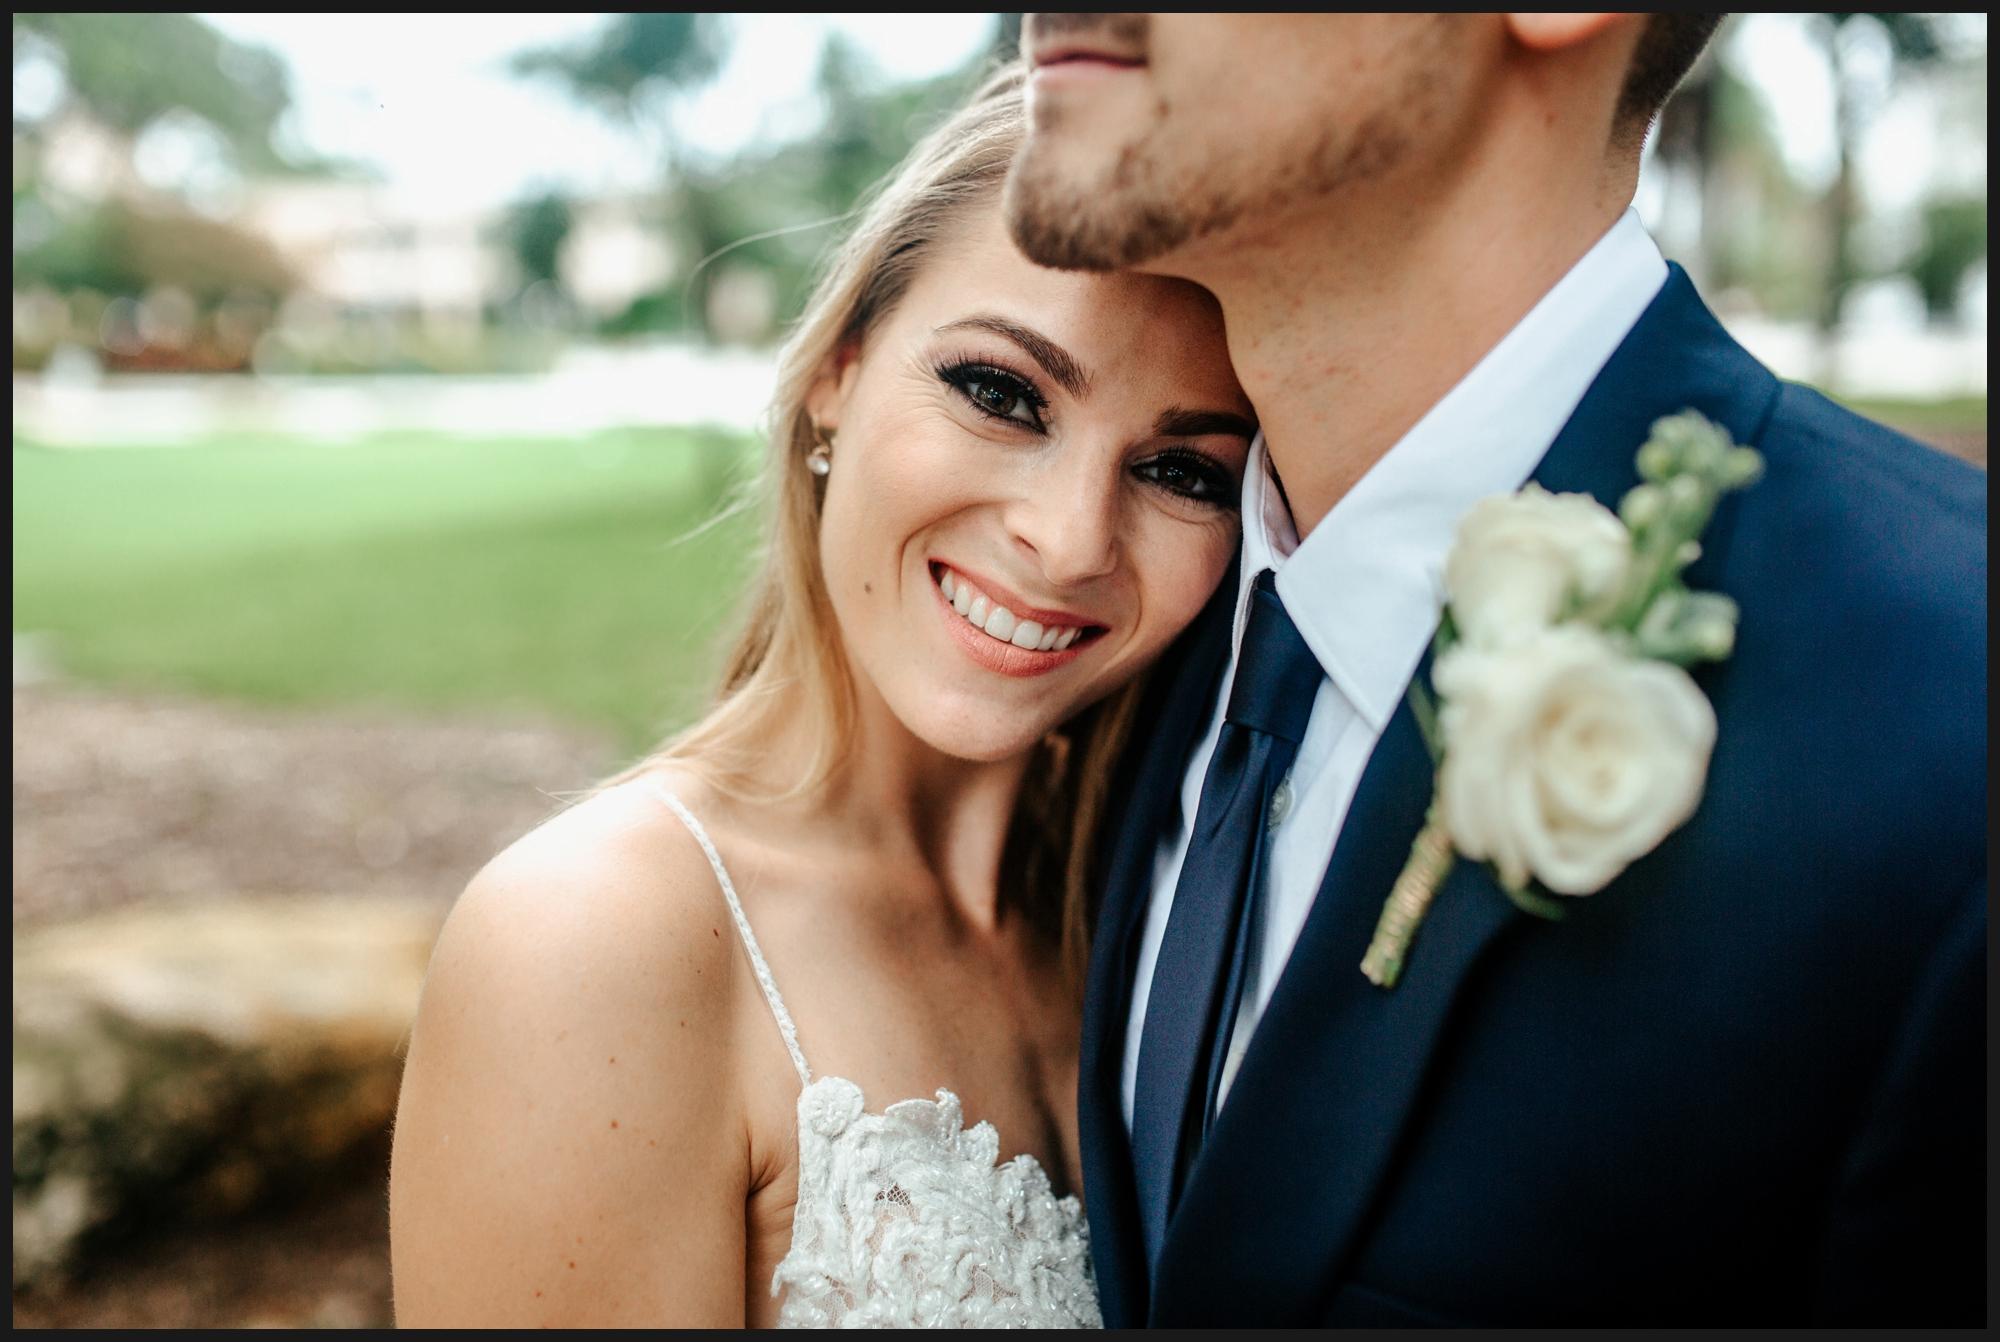 Orlando-Wedding-Photographer-destination-wedding-photographer-florida-wedding-photographer-bohemian-wedding-photographer_0098.jpg